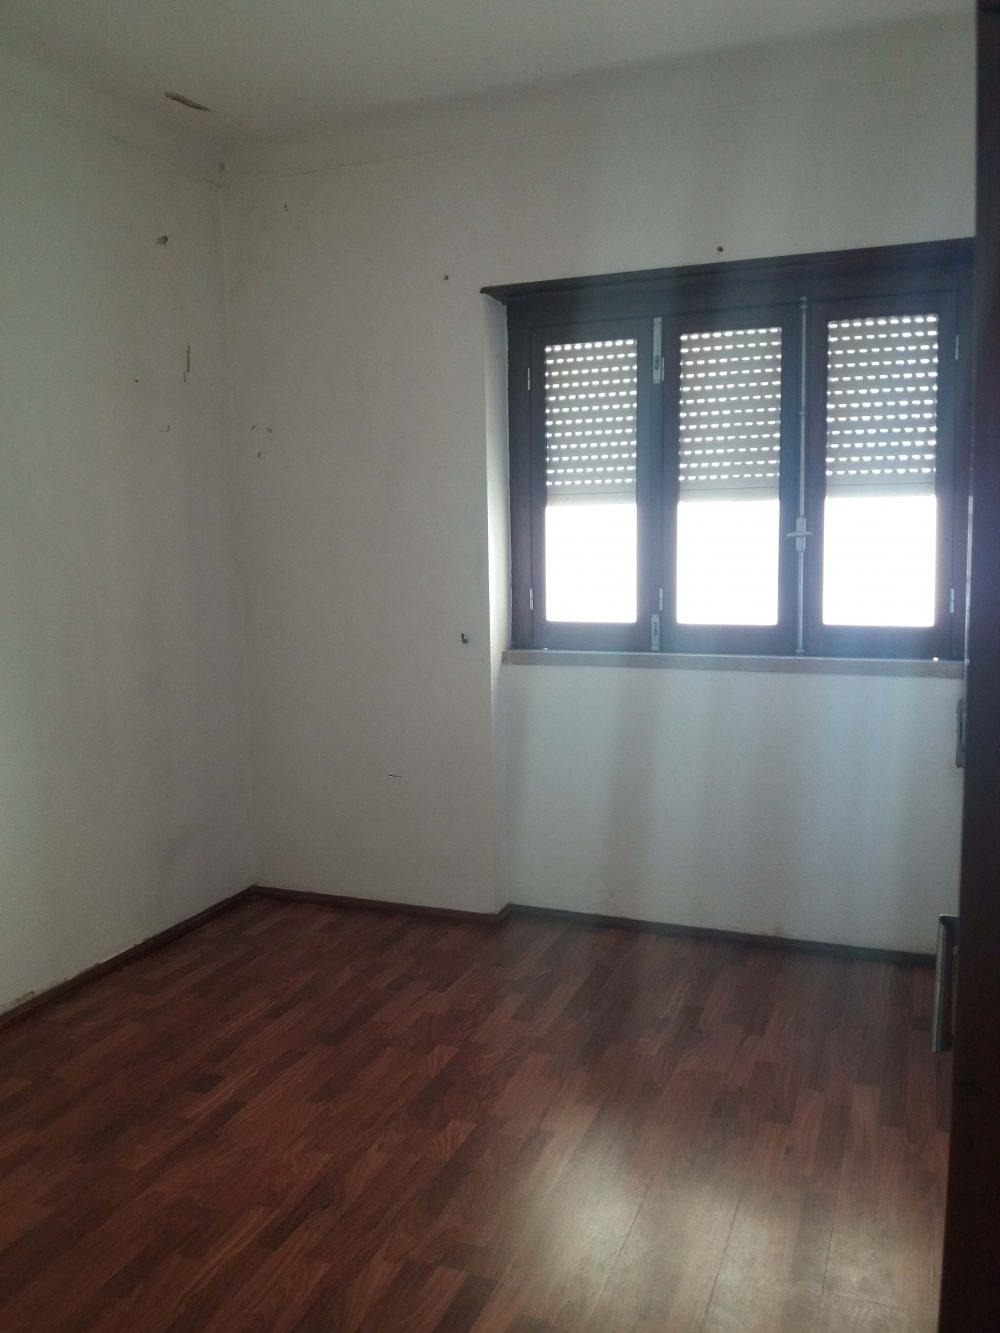 18-Bedroom 2 house 2